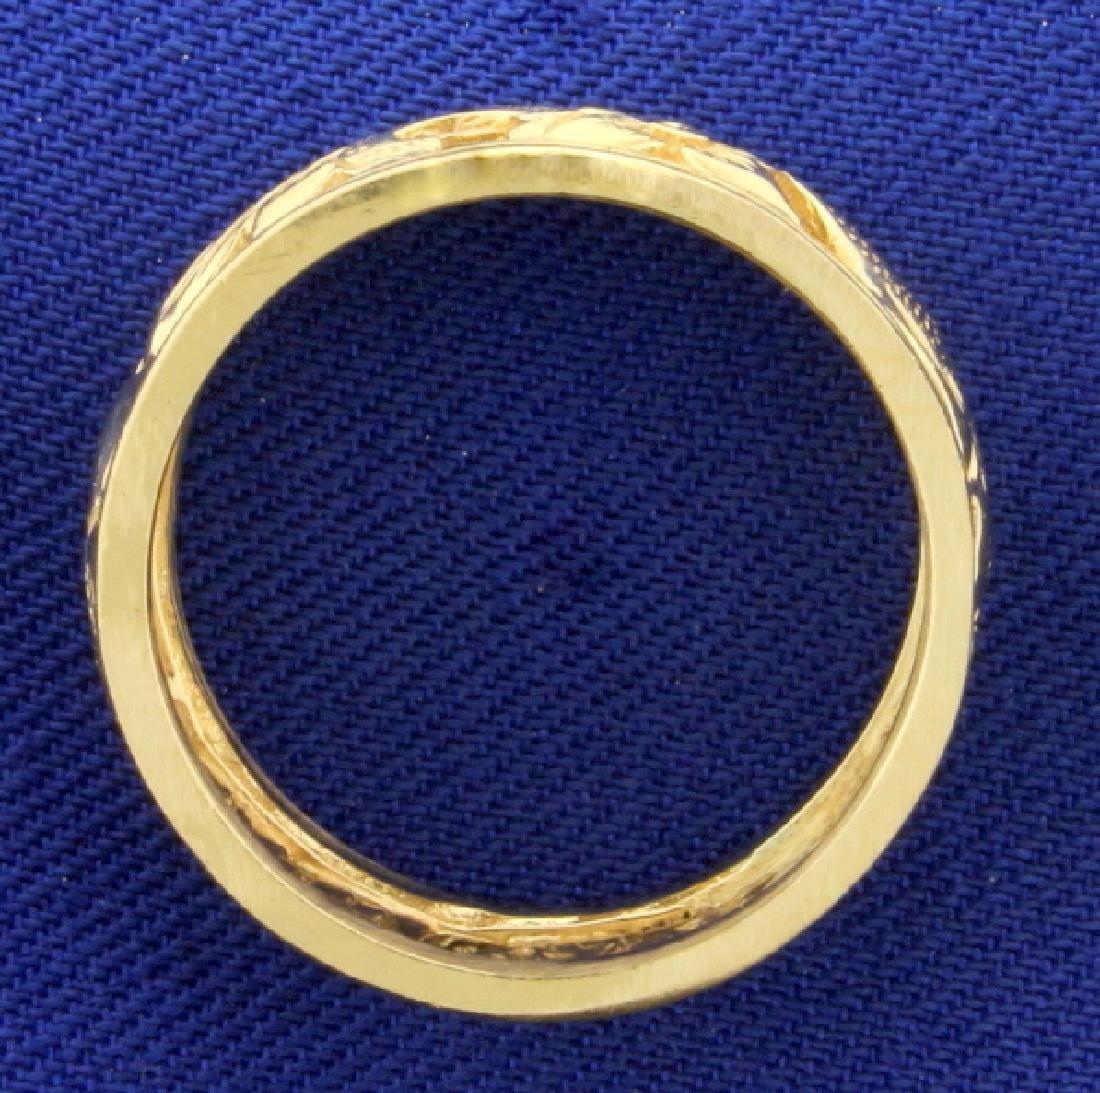 Flower Design Band Ring in 14k Gold - 2